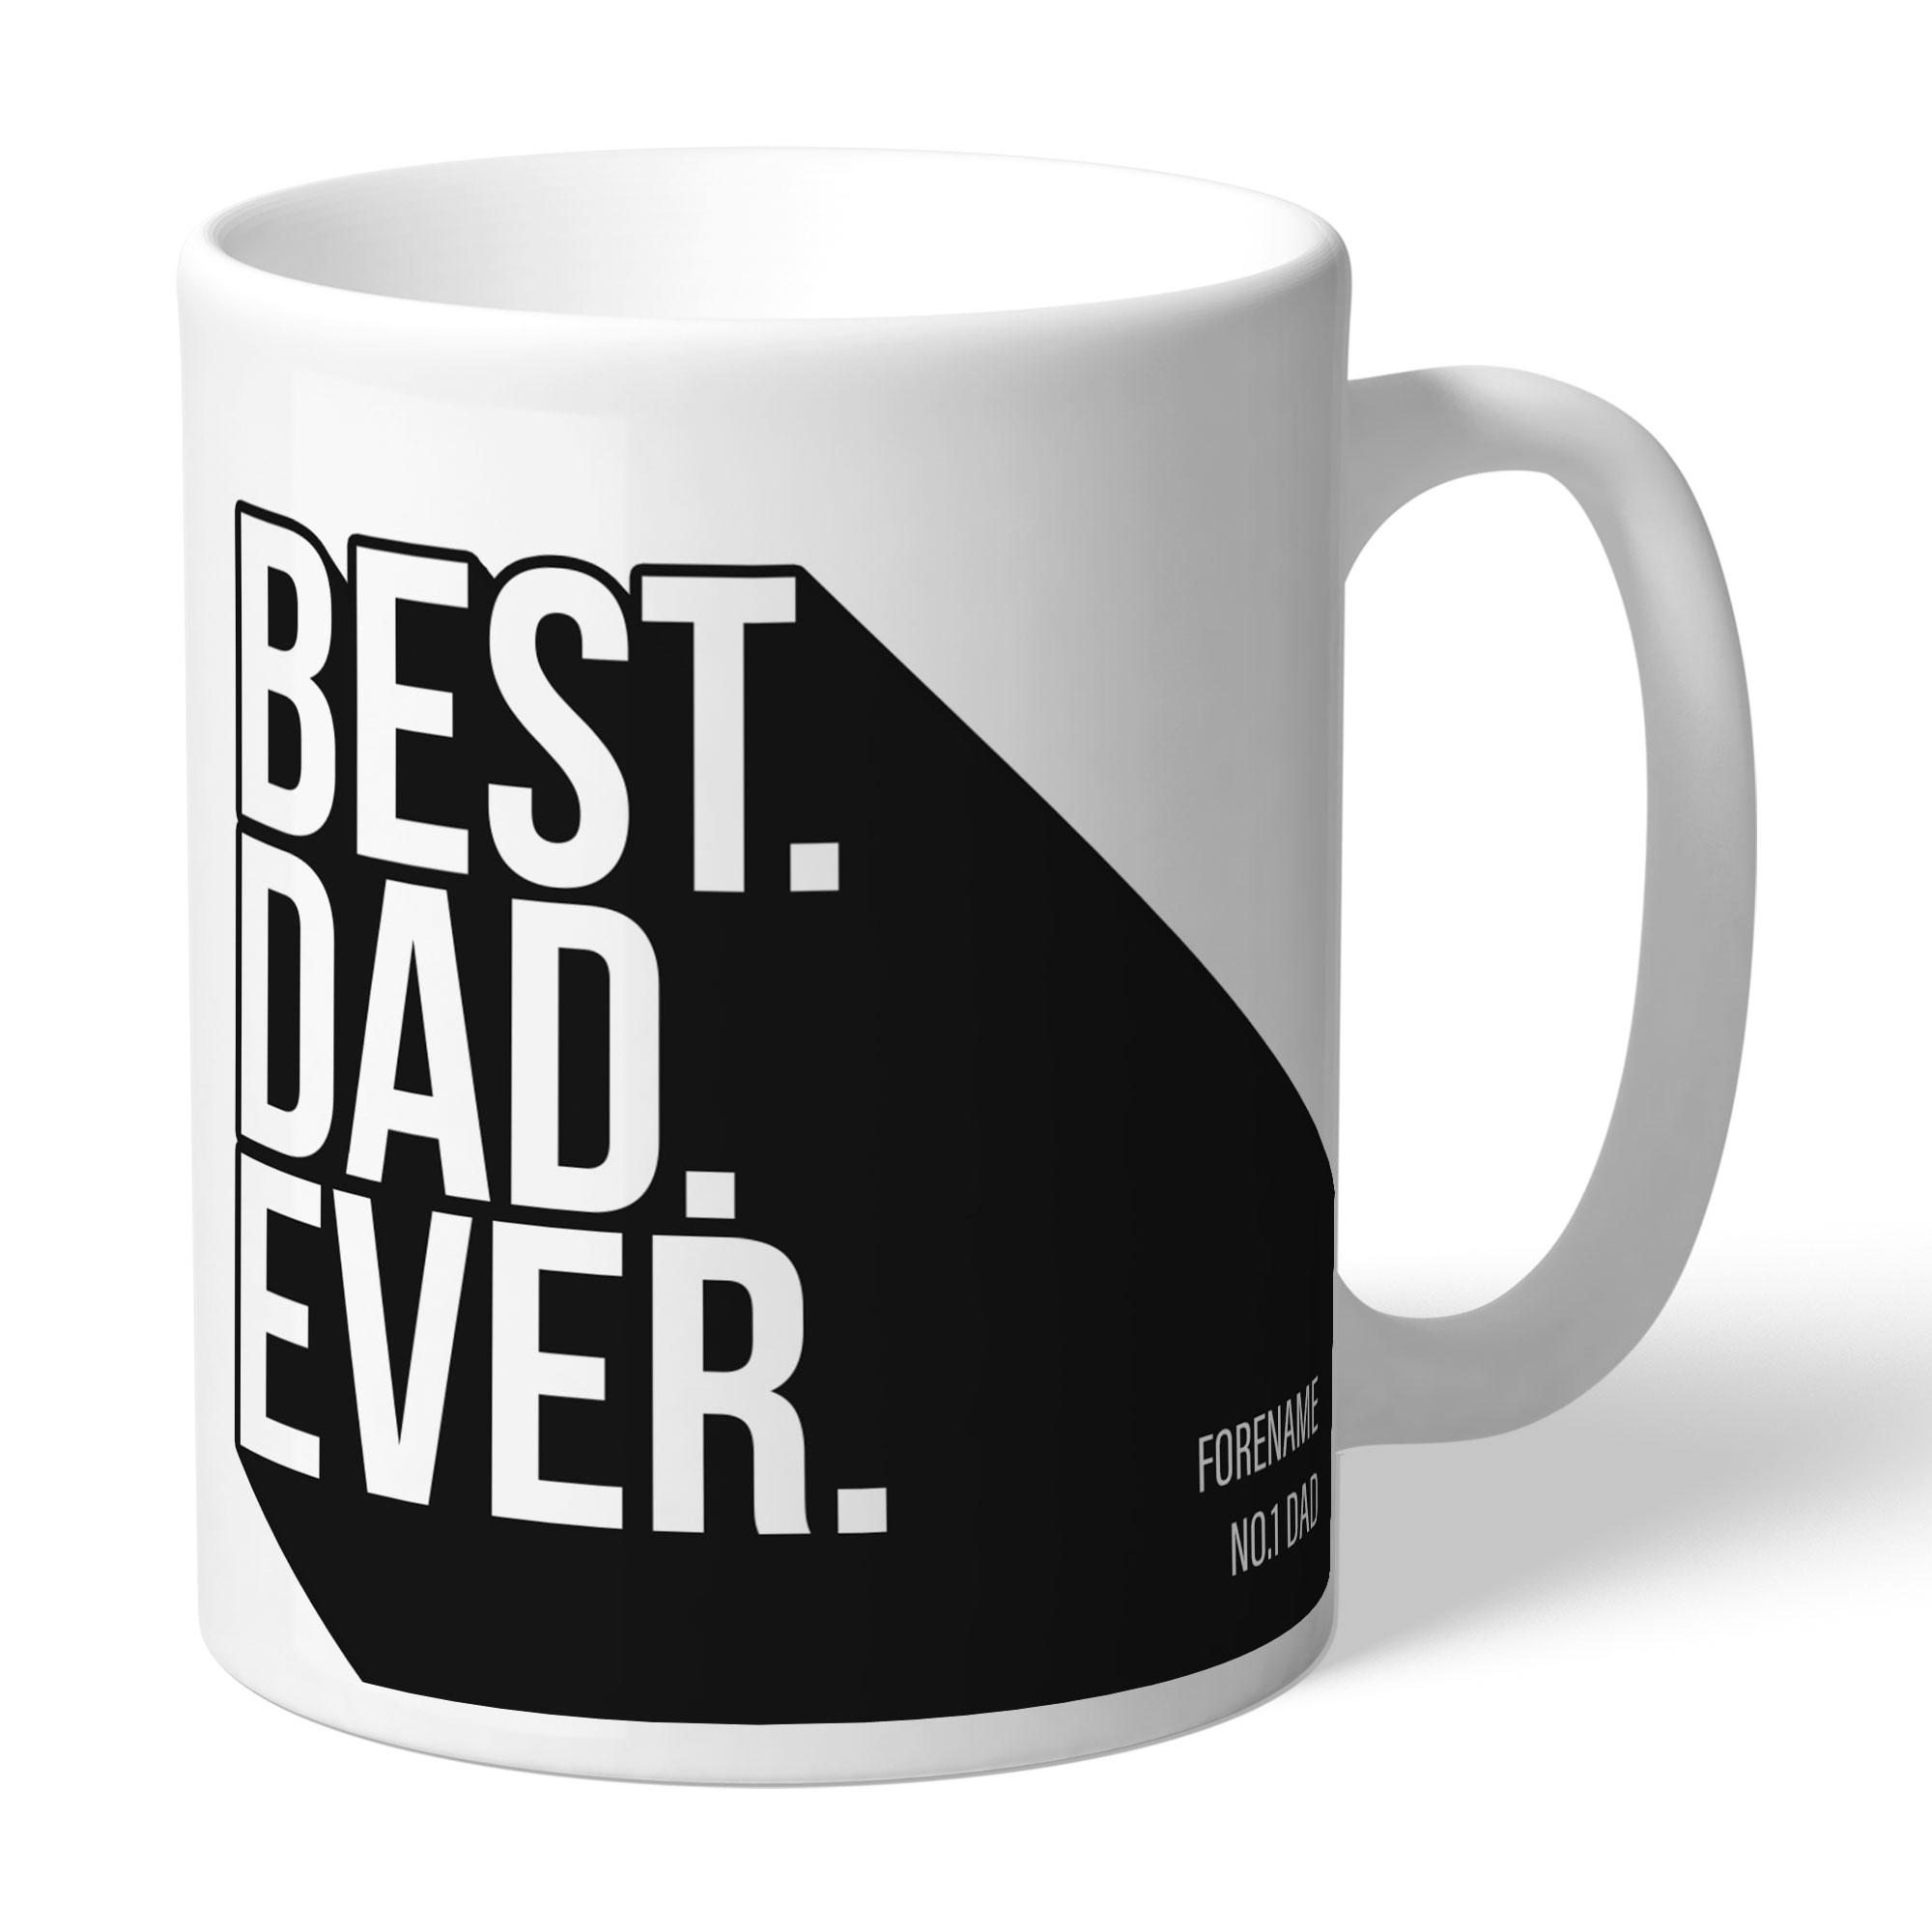 Swansea City AFC Best Dad Ever Mug